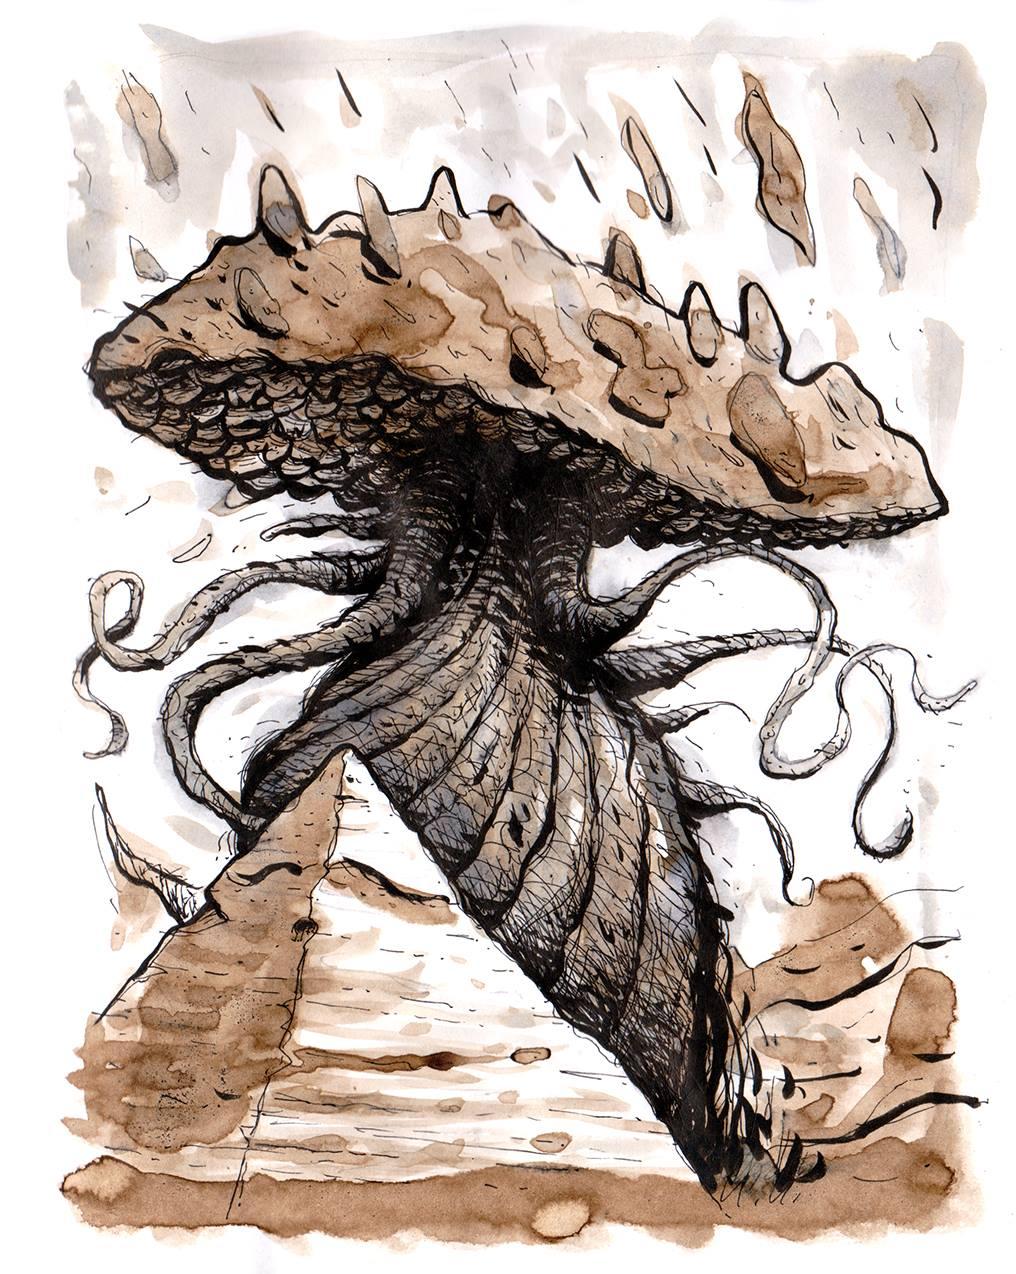 Monstrous Lovecraftian Fungi